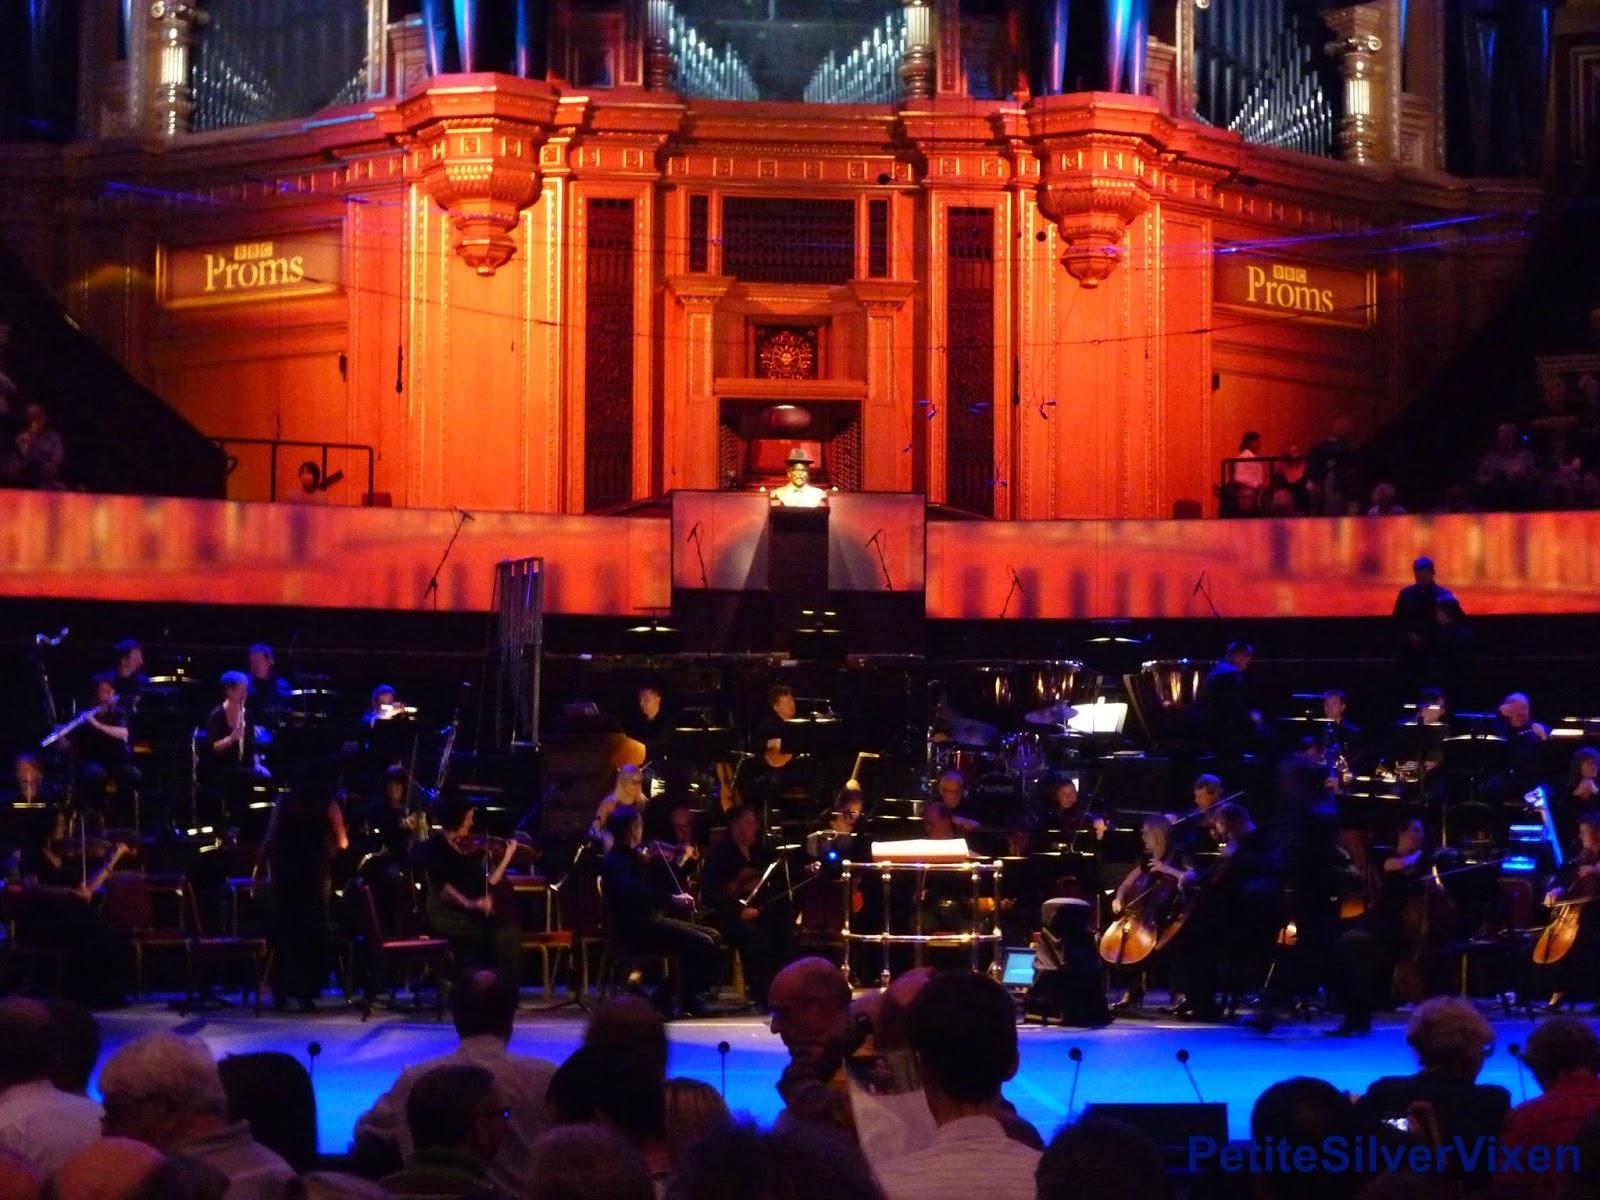 Orchestra Tuning Up | PetiteSilverVixen